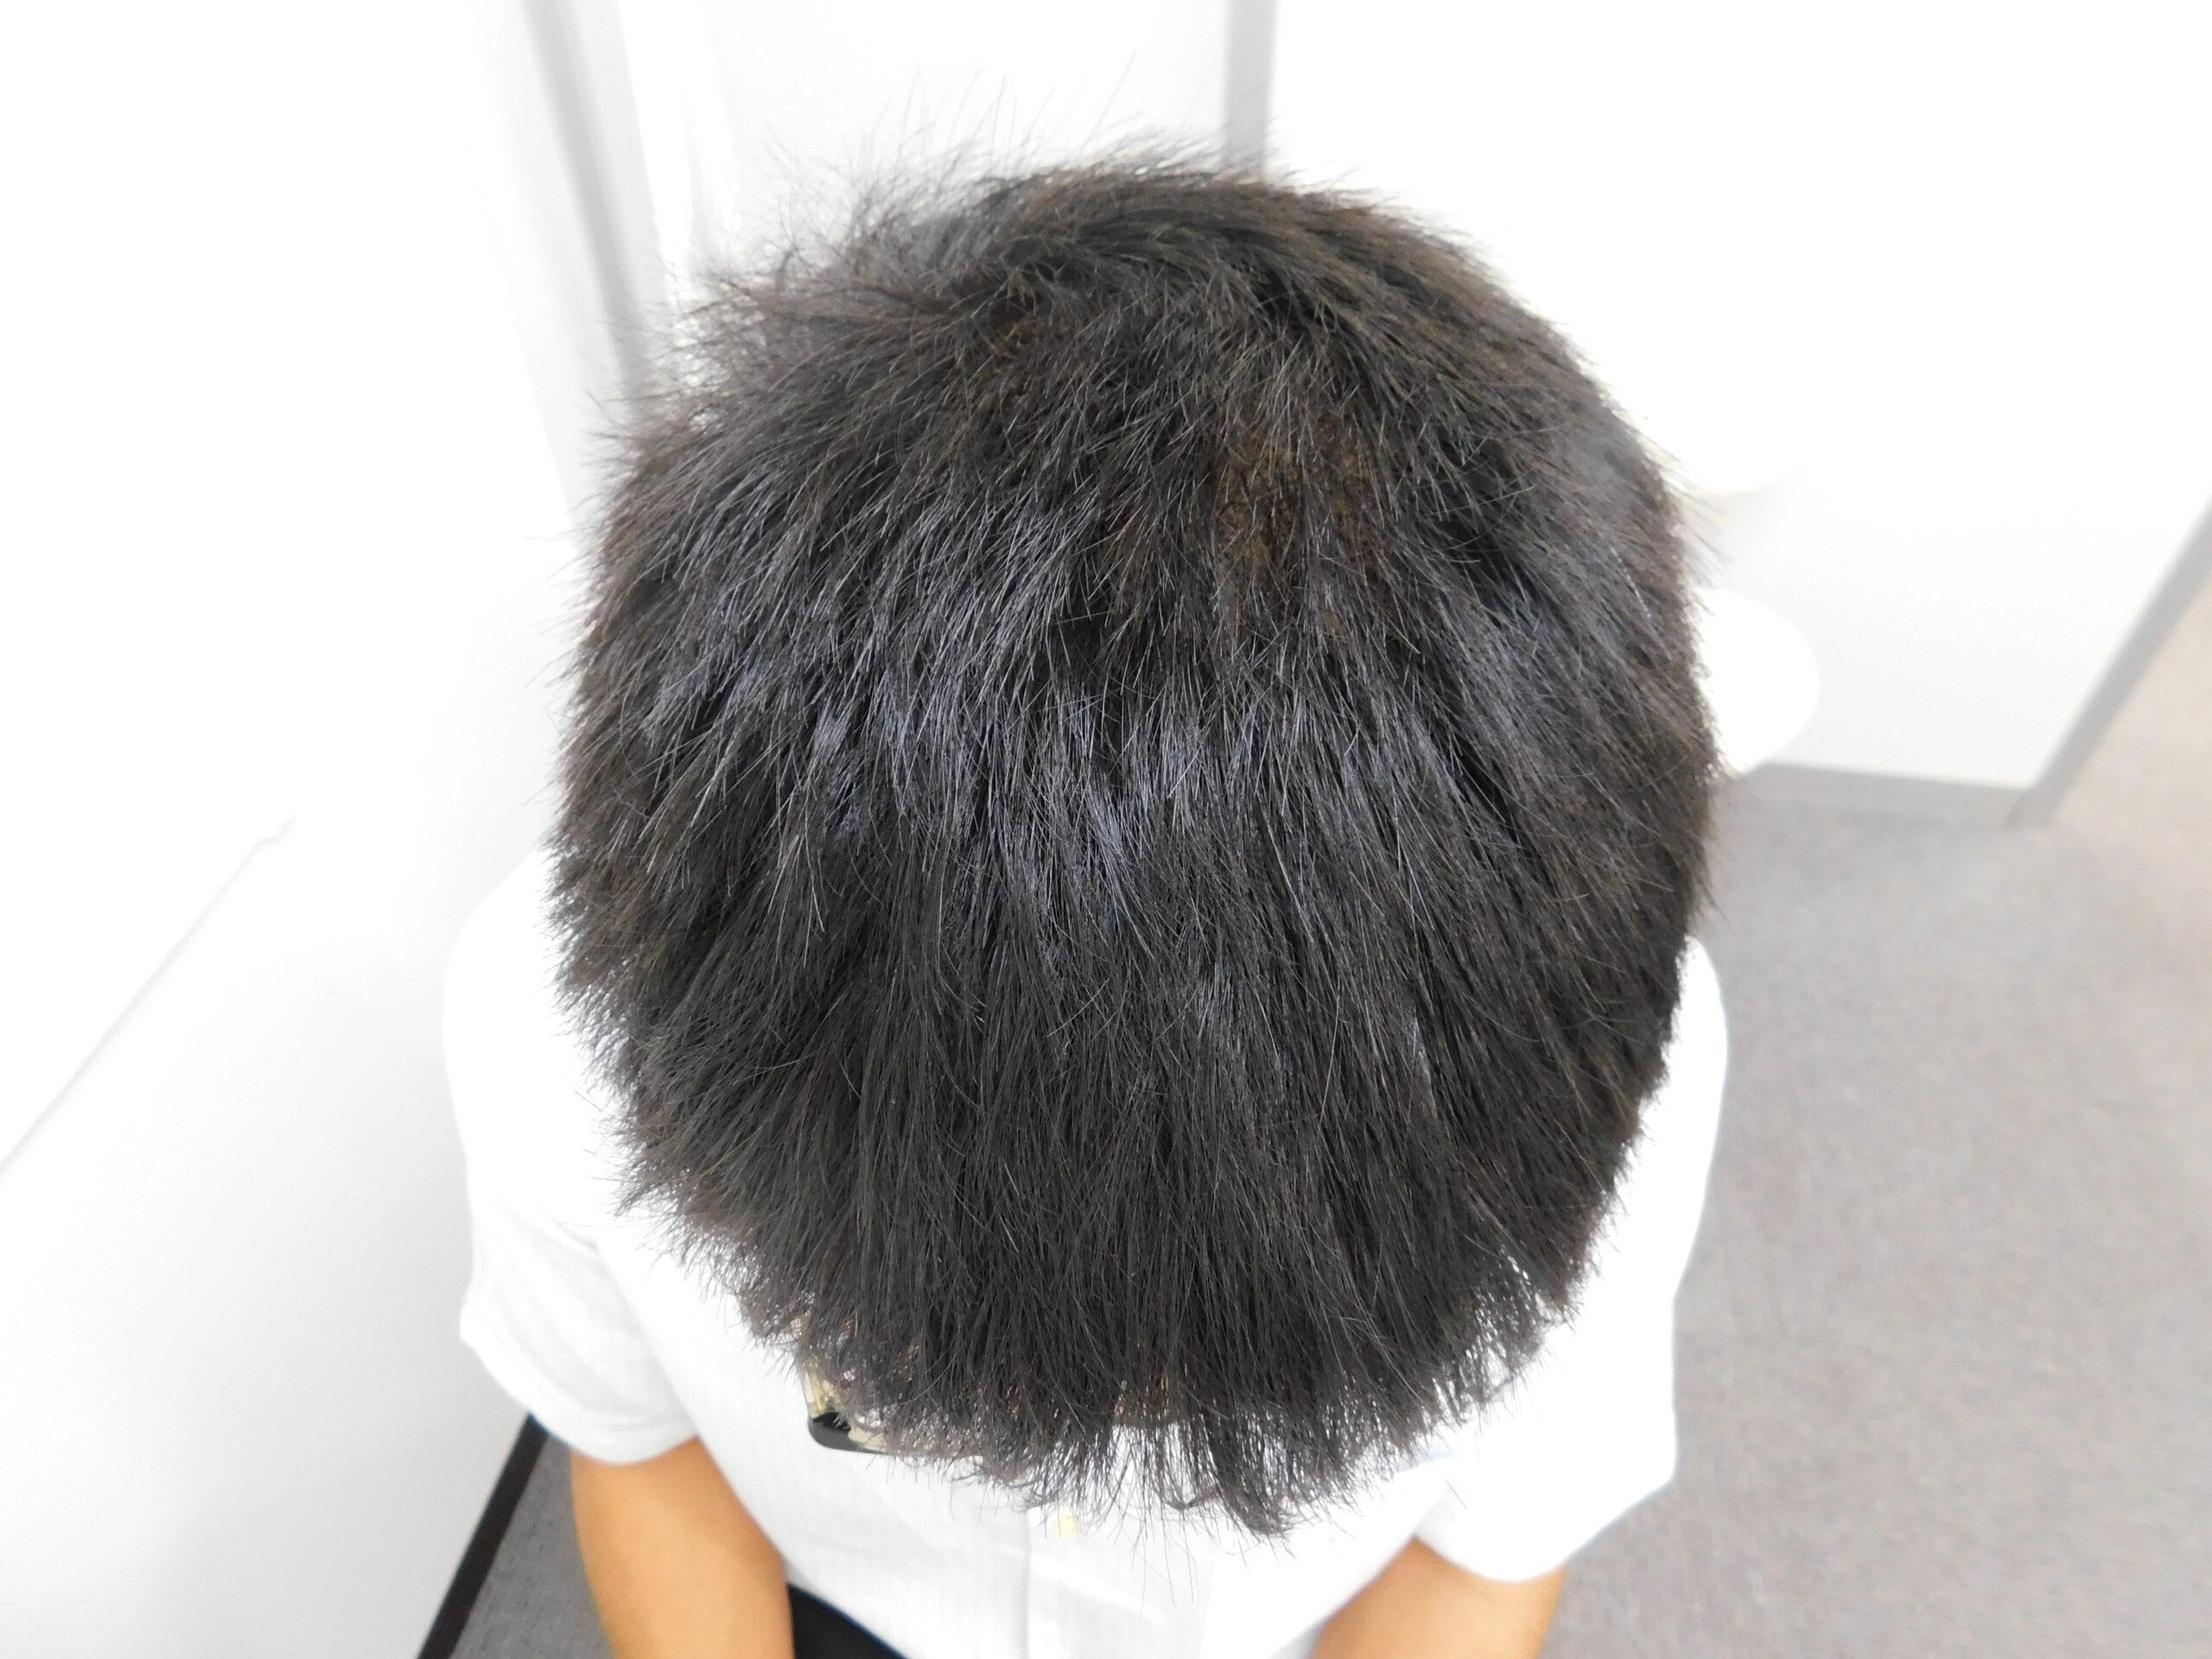 水戸市のAGA改善事例(20代男性・治療後)